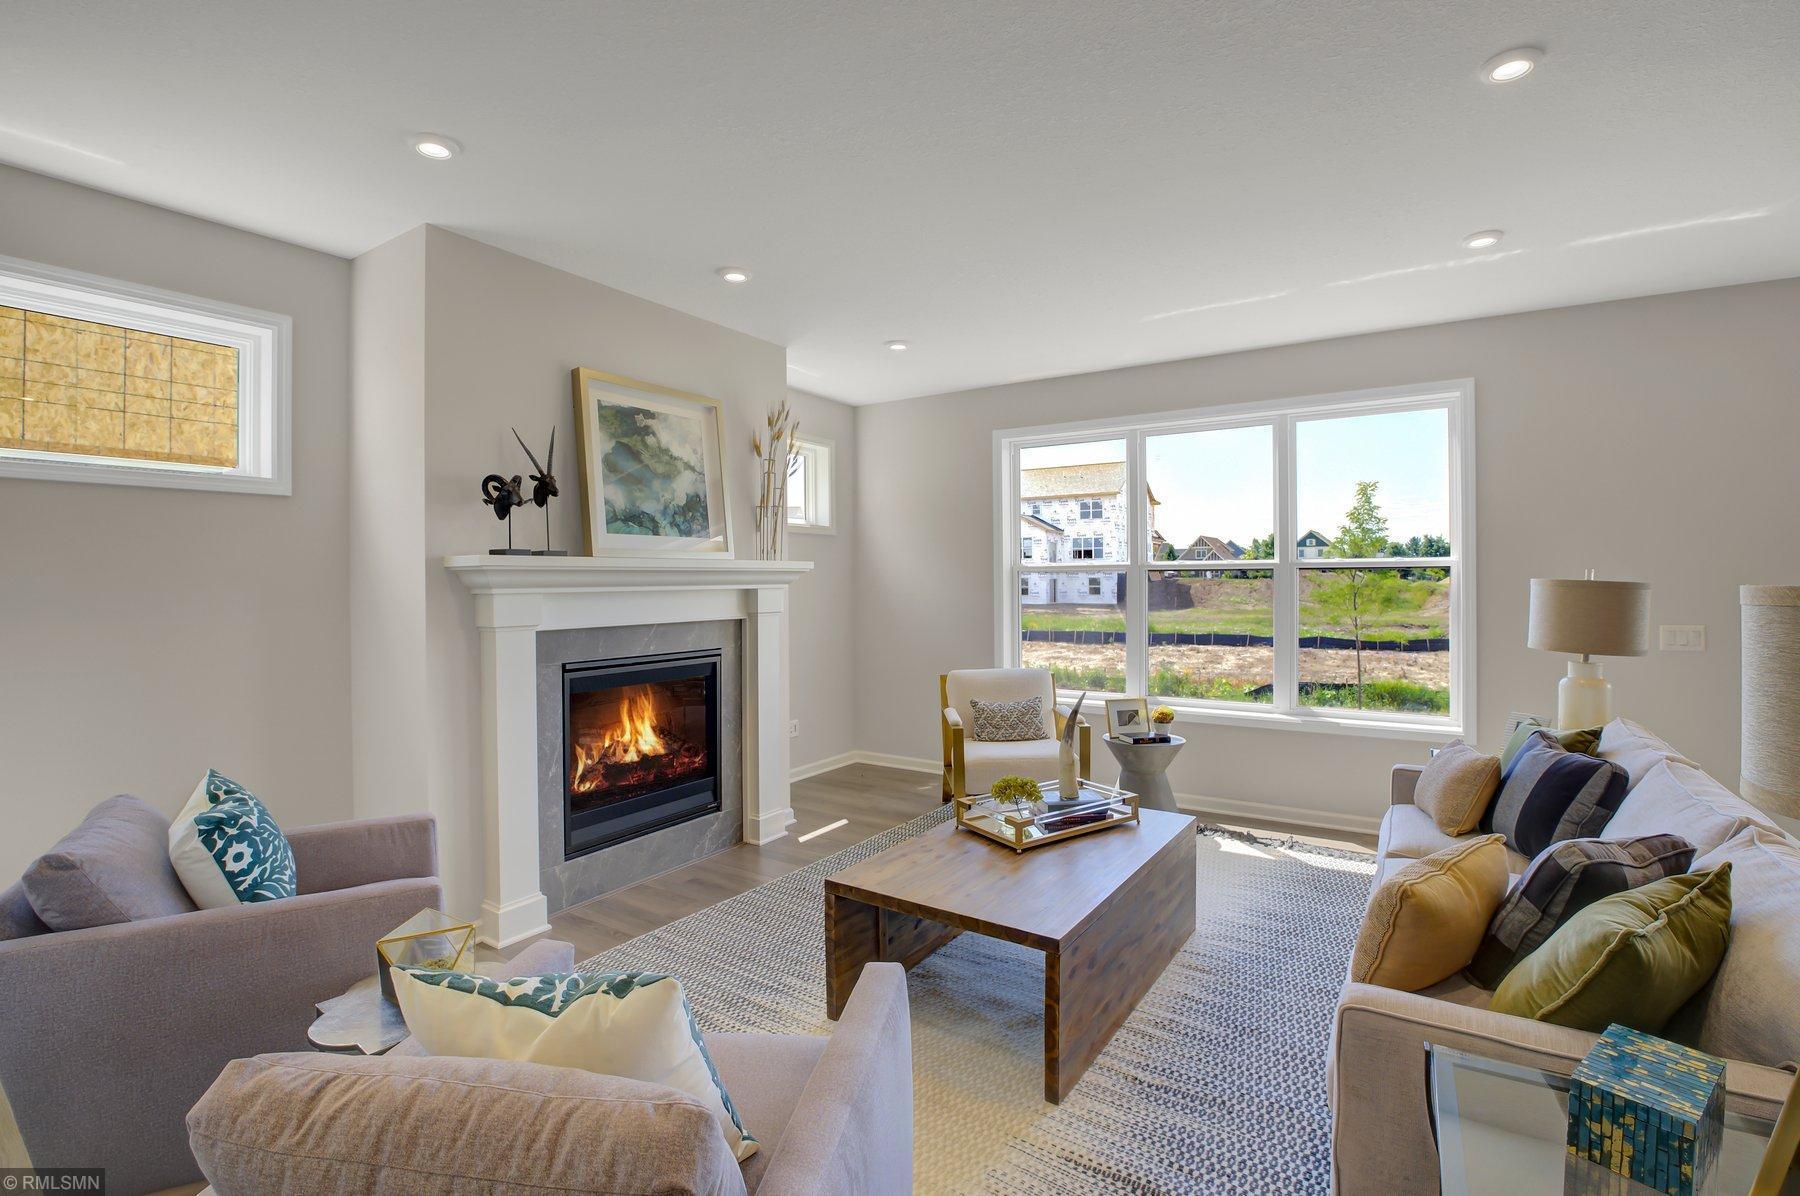 1111 Inspiration N Property Photo - Bayport, MN real estate listing